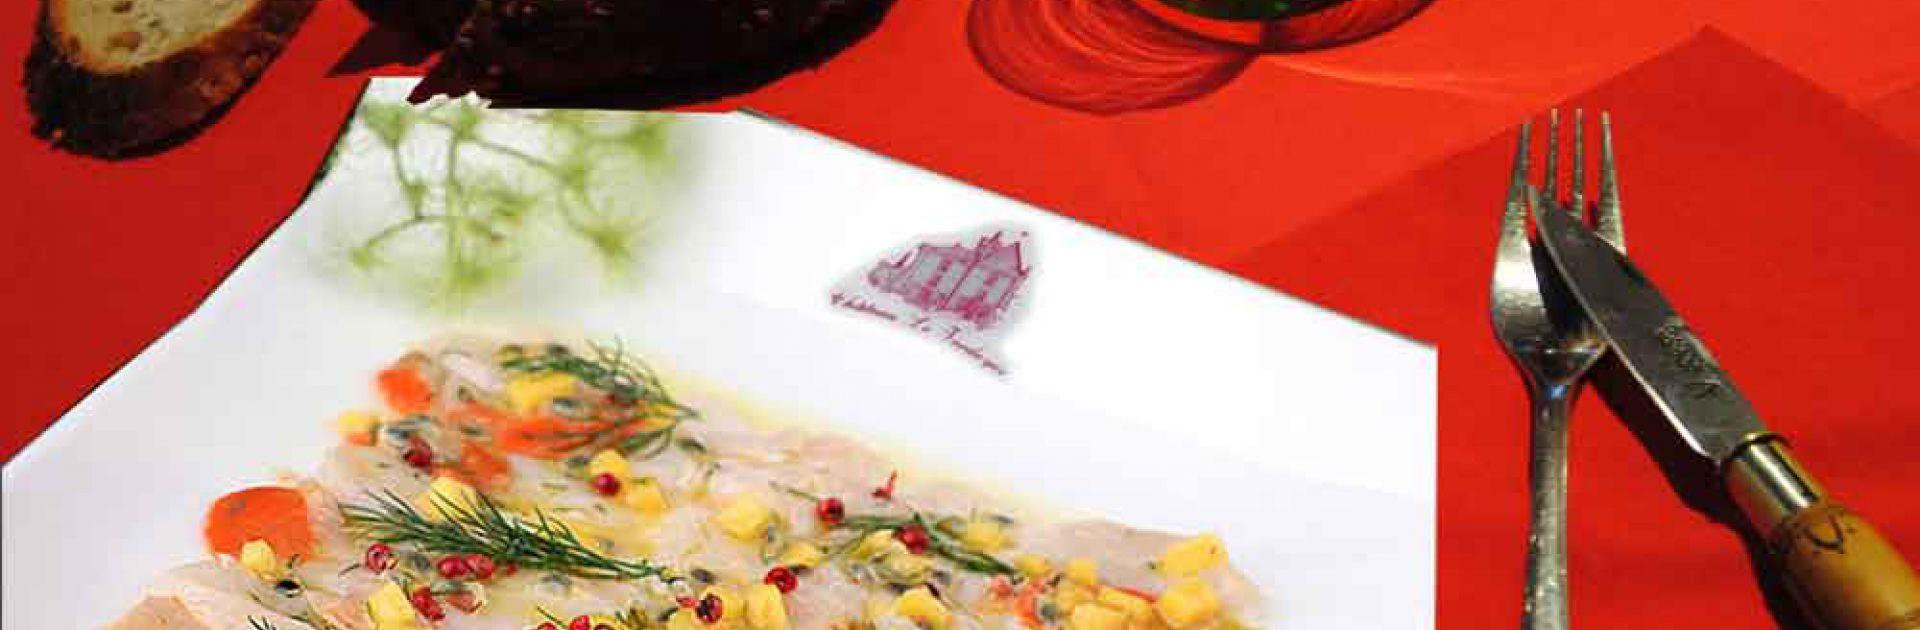 Scallop Mango seafood